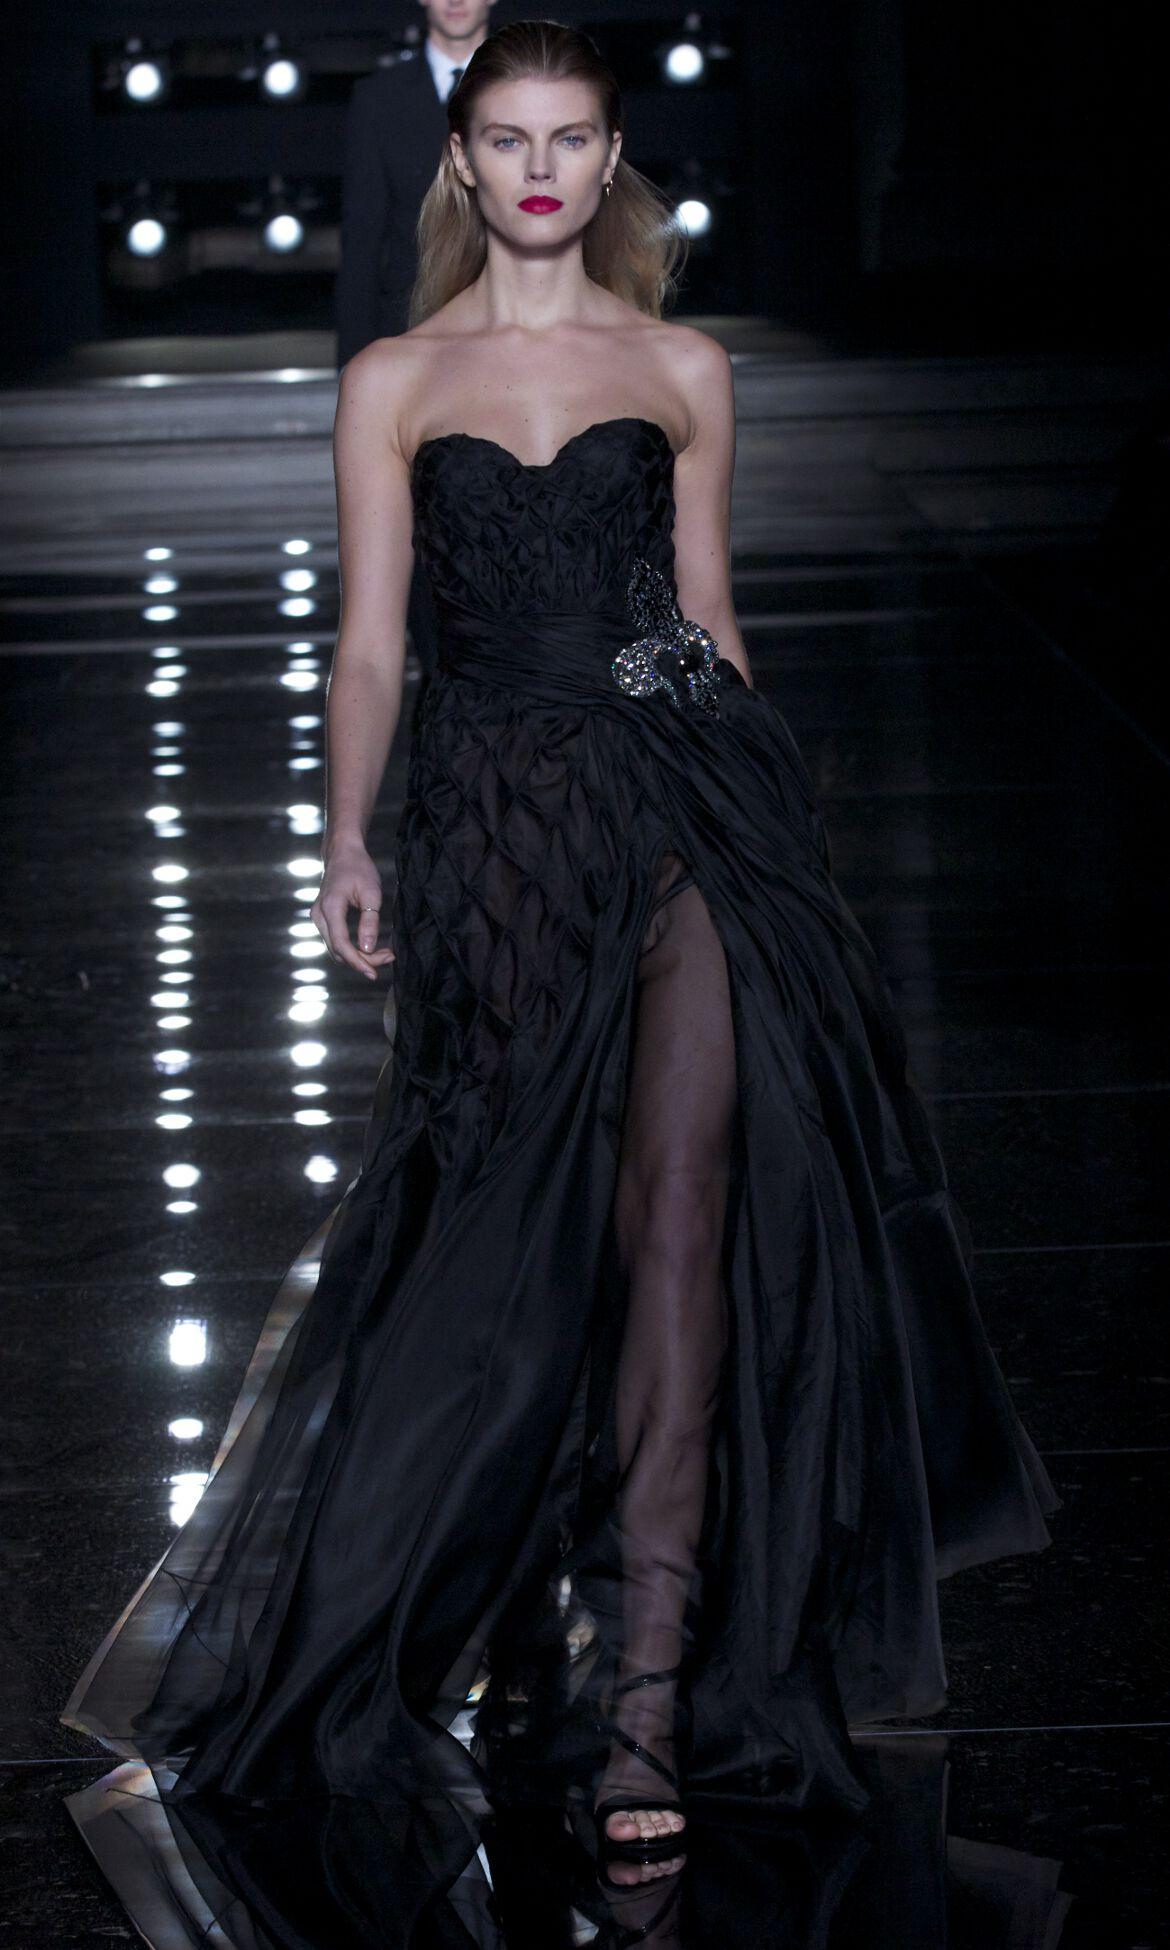 Fashion Show Model Black Dress